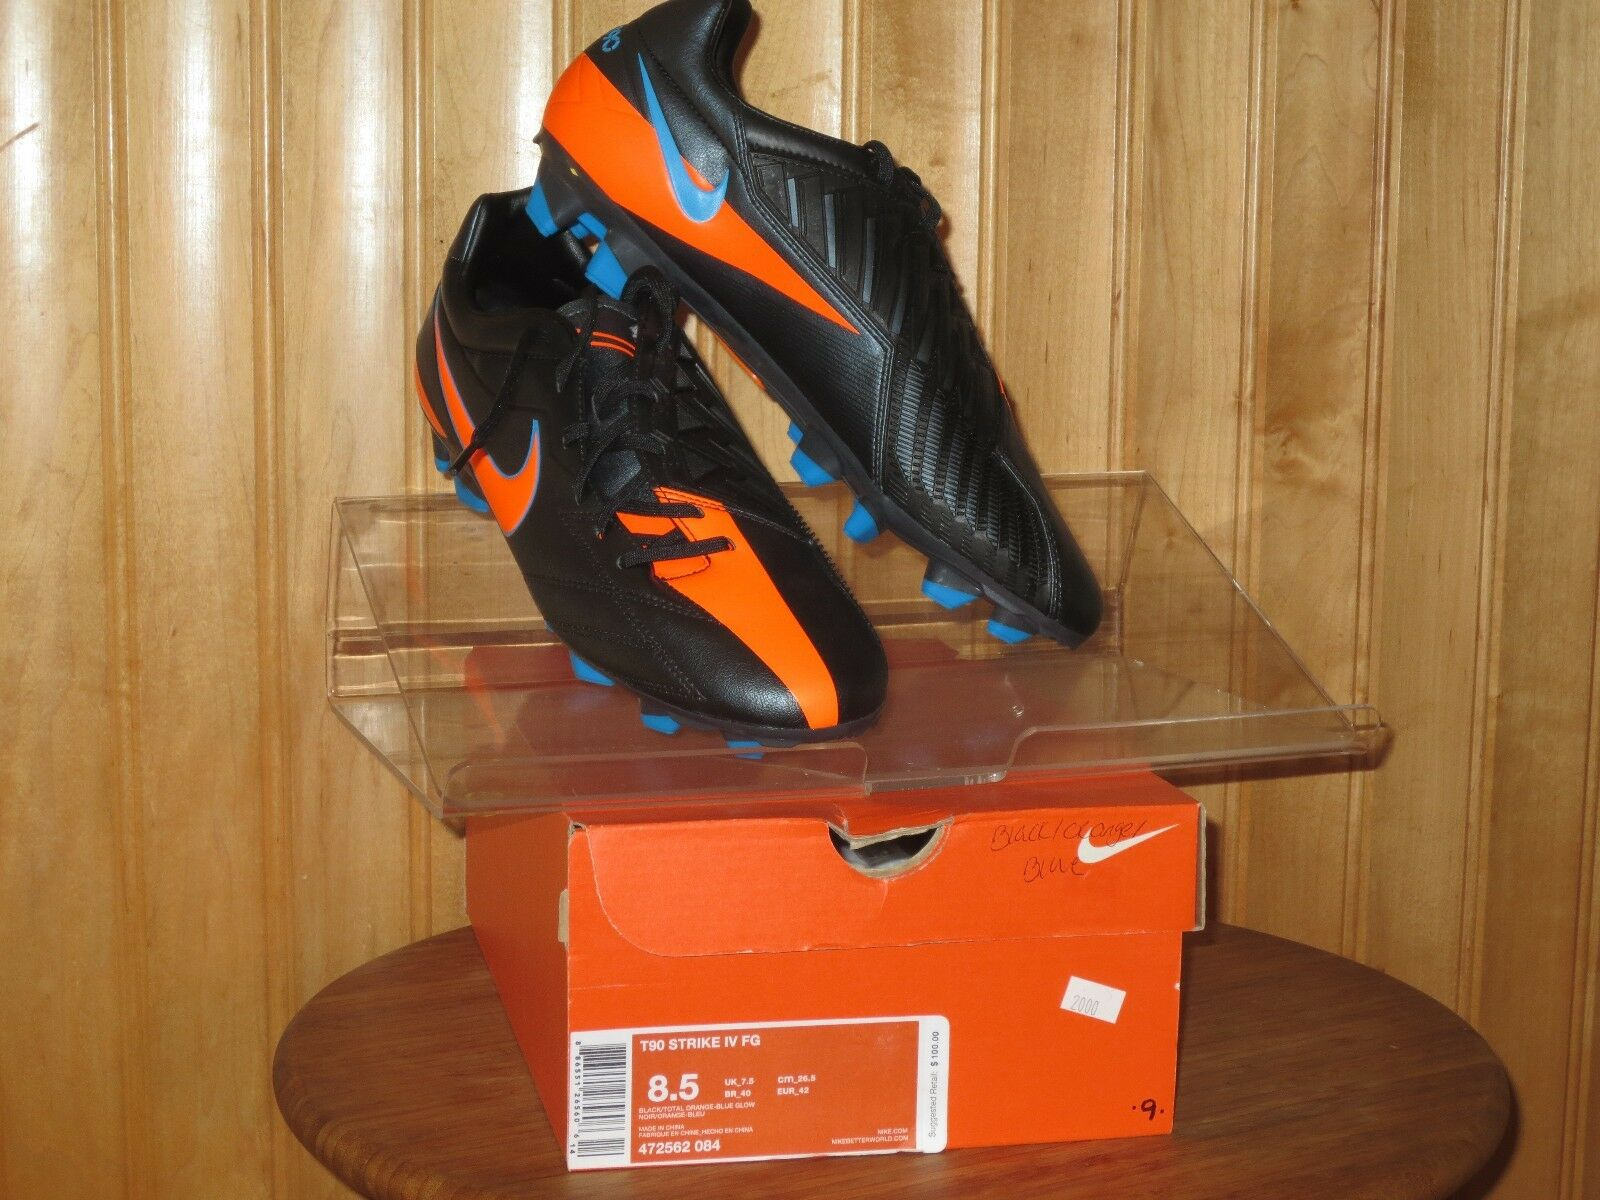 The most popular shoes for men and women NEW NIKE T90 STRIKE IV FG Soccer Cleats MENS Black Orange NIB